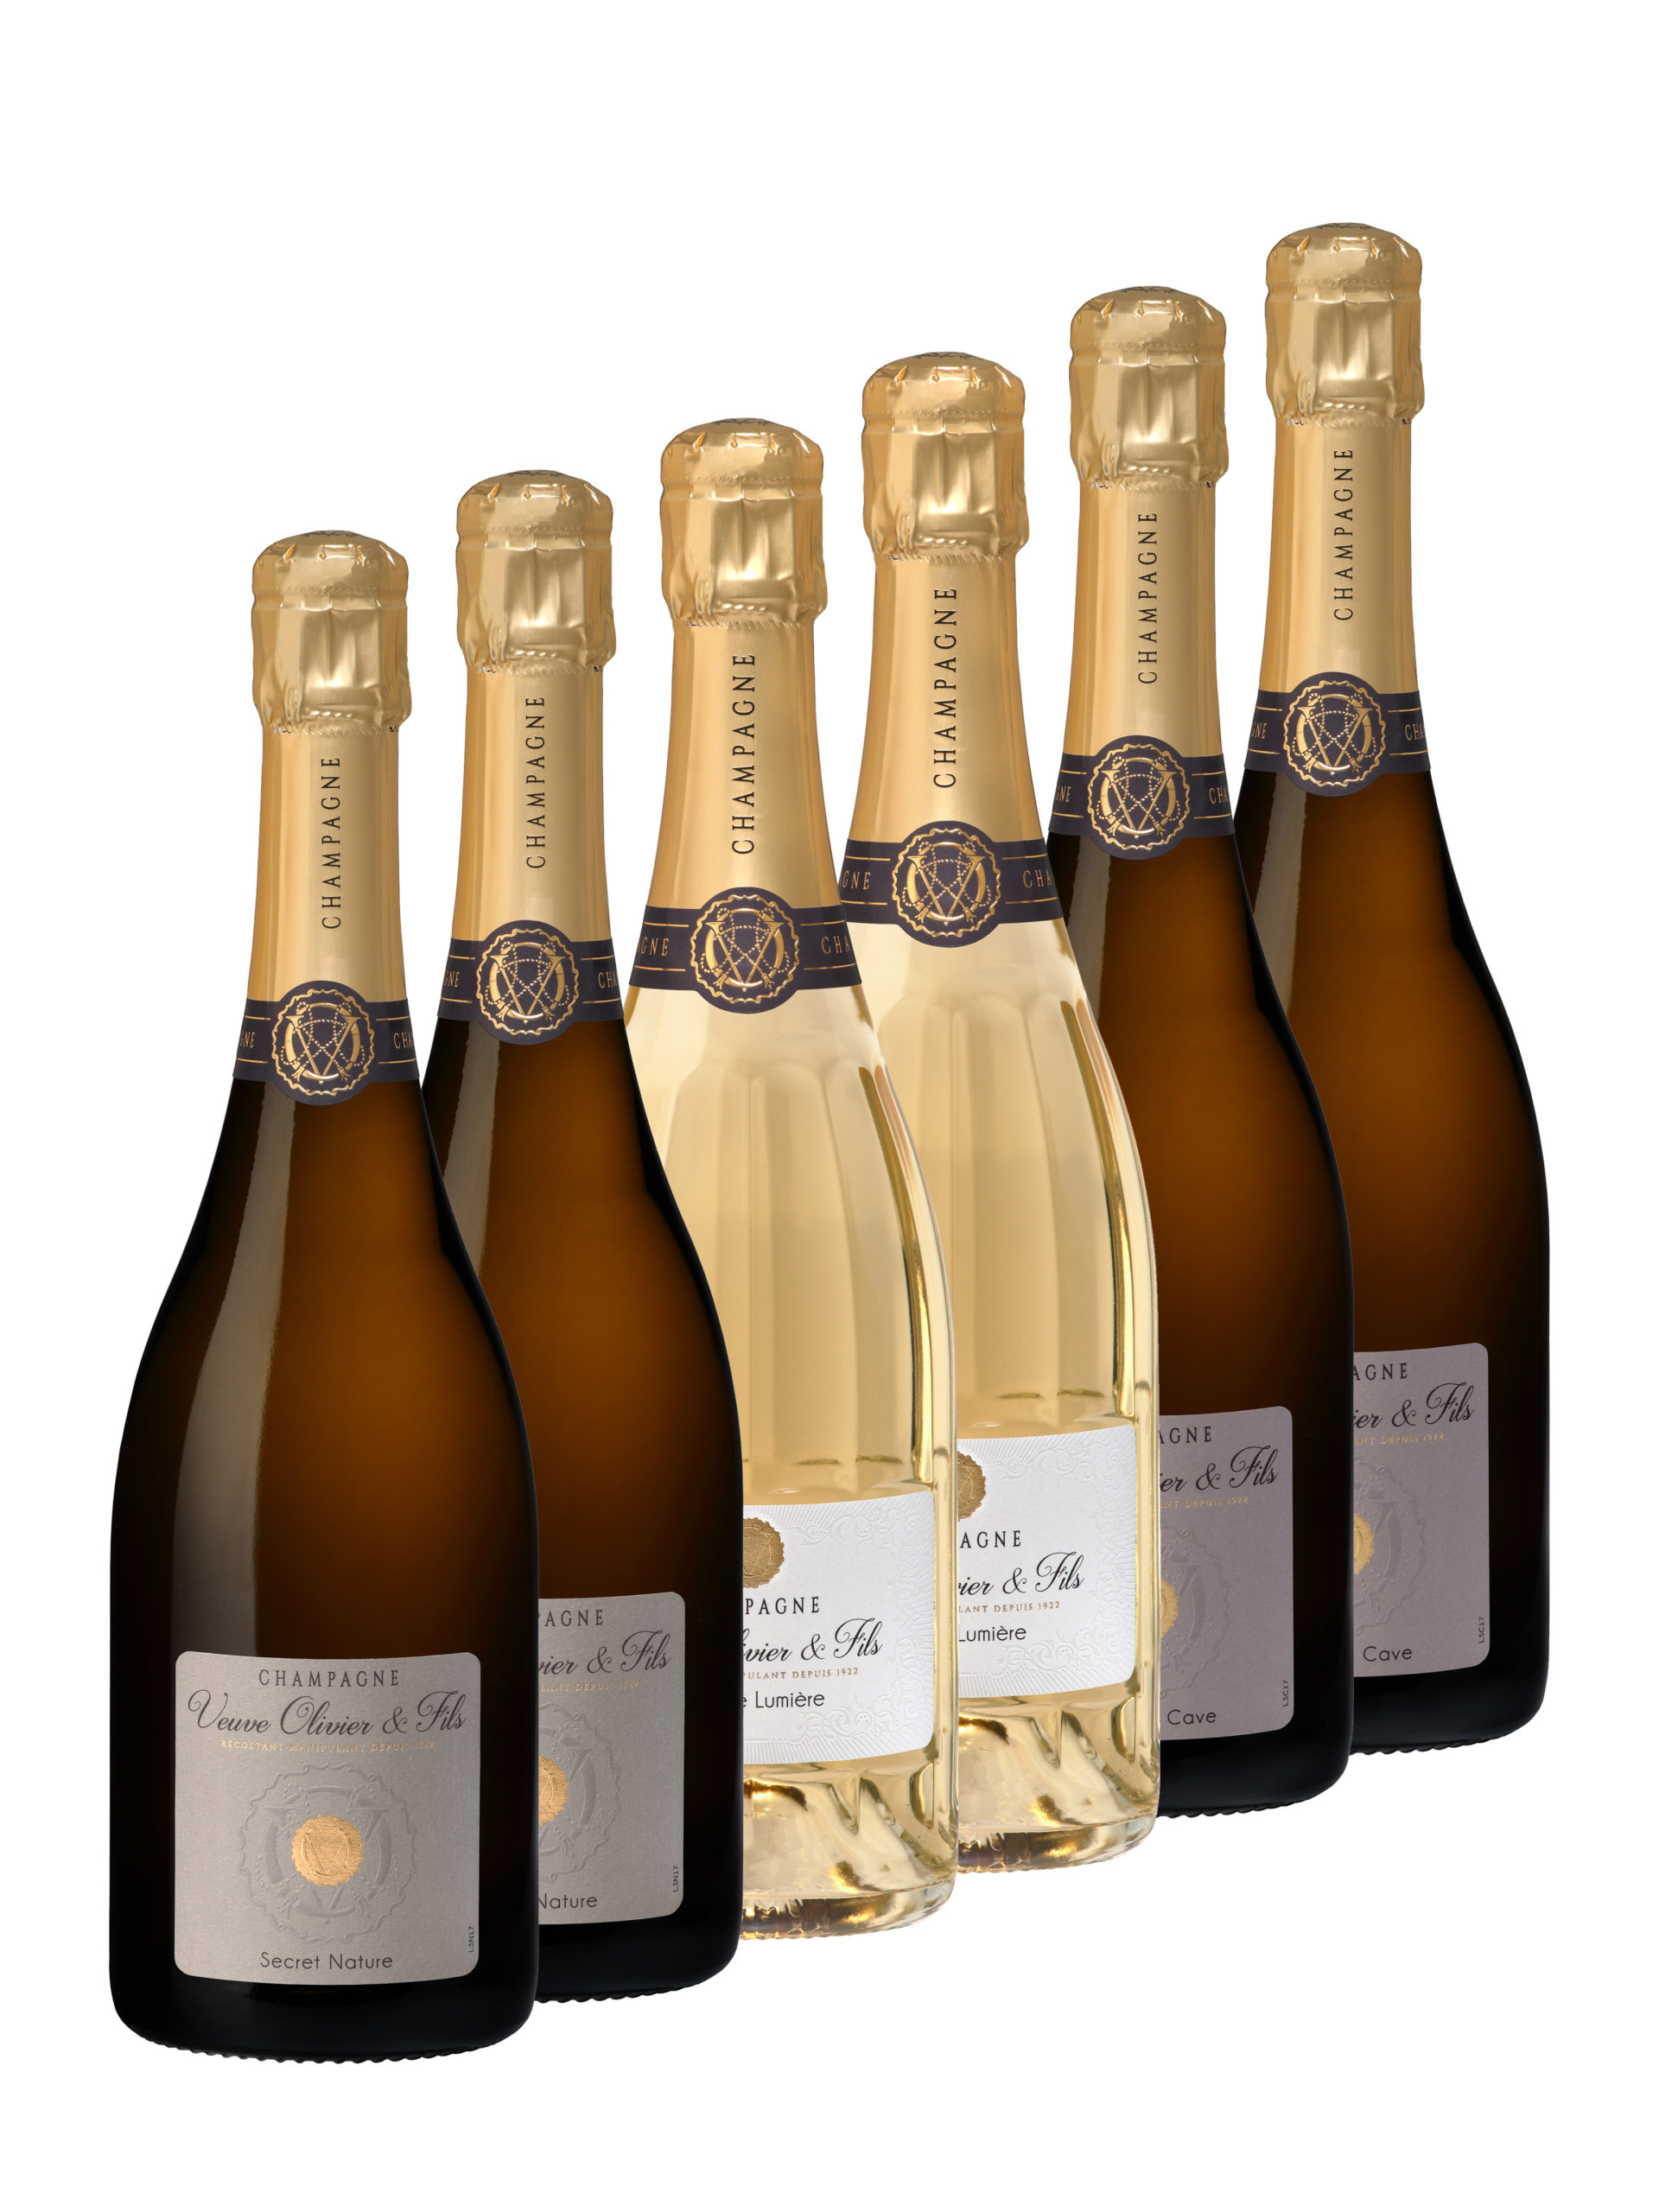 Coffret 6 Champagne Veuve Olivier & Fils